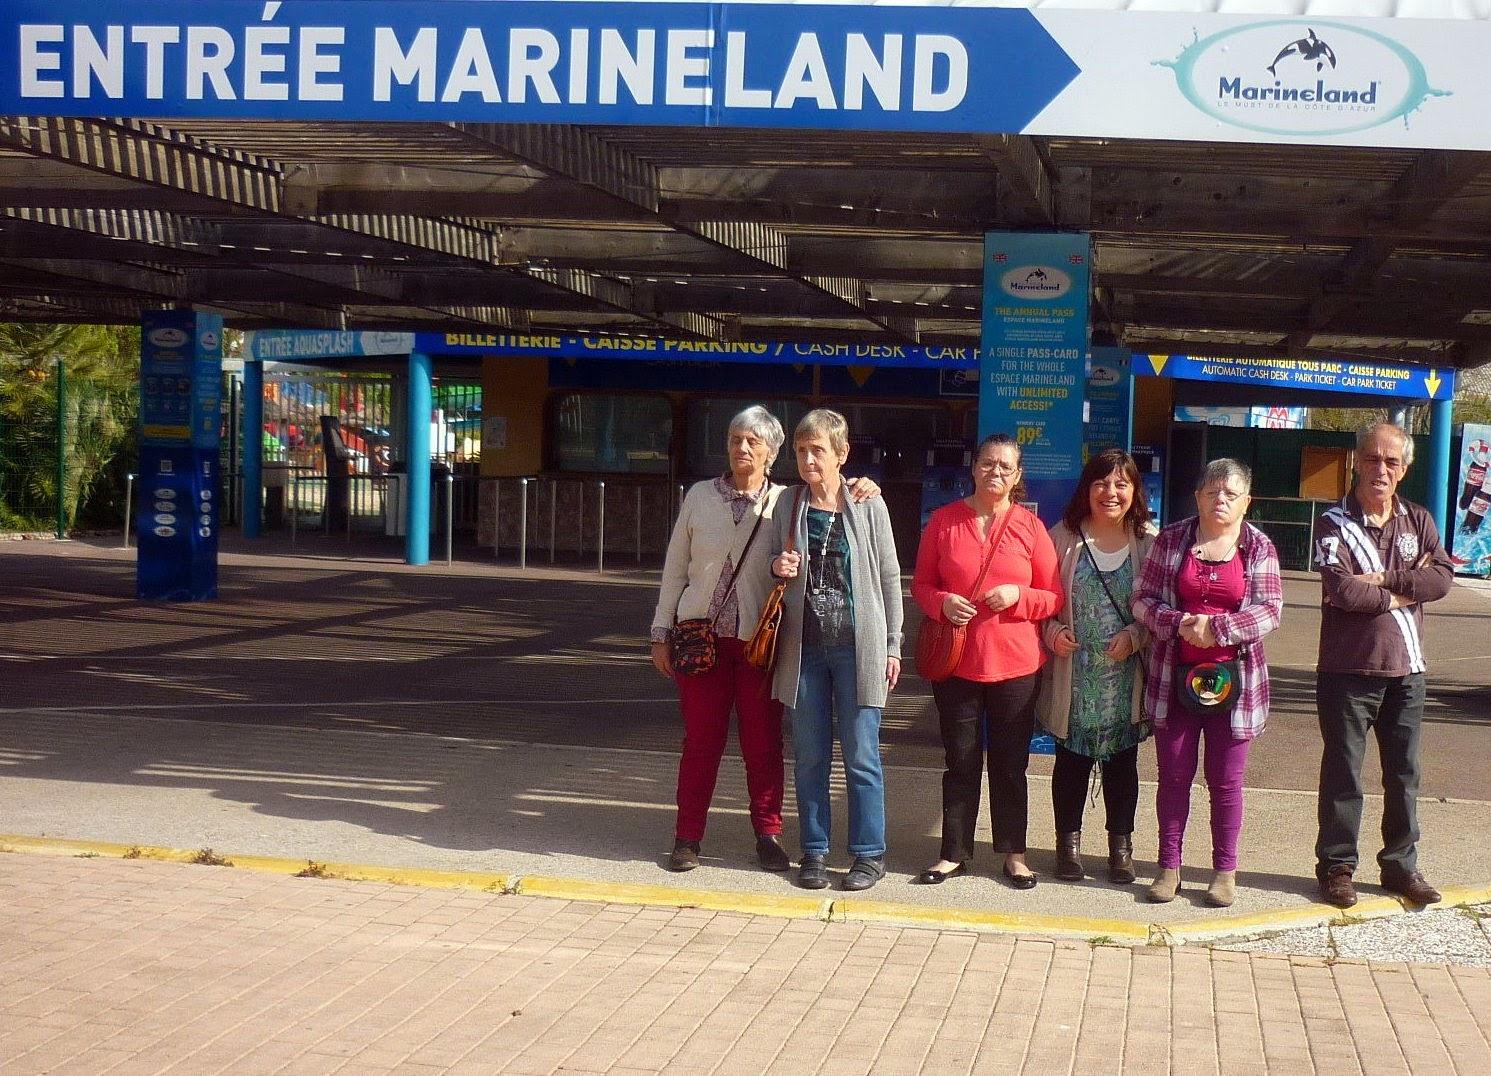 Ensemble avec eux s jour antibes parc aquatique marineland for Meteorama antibes